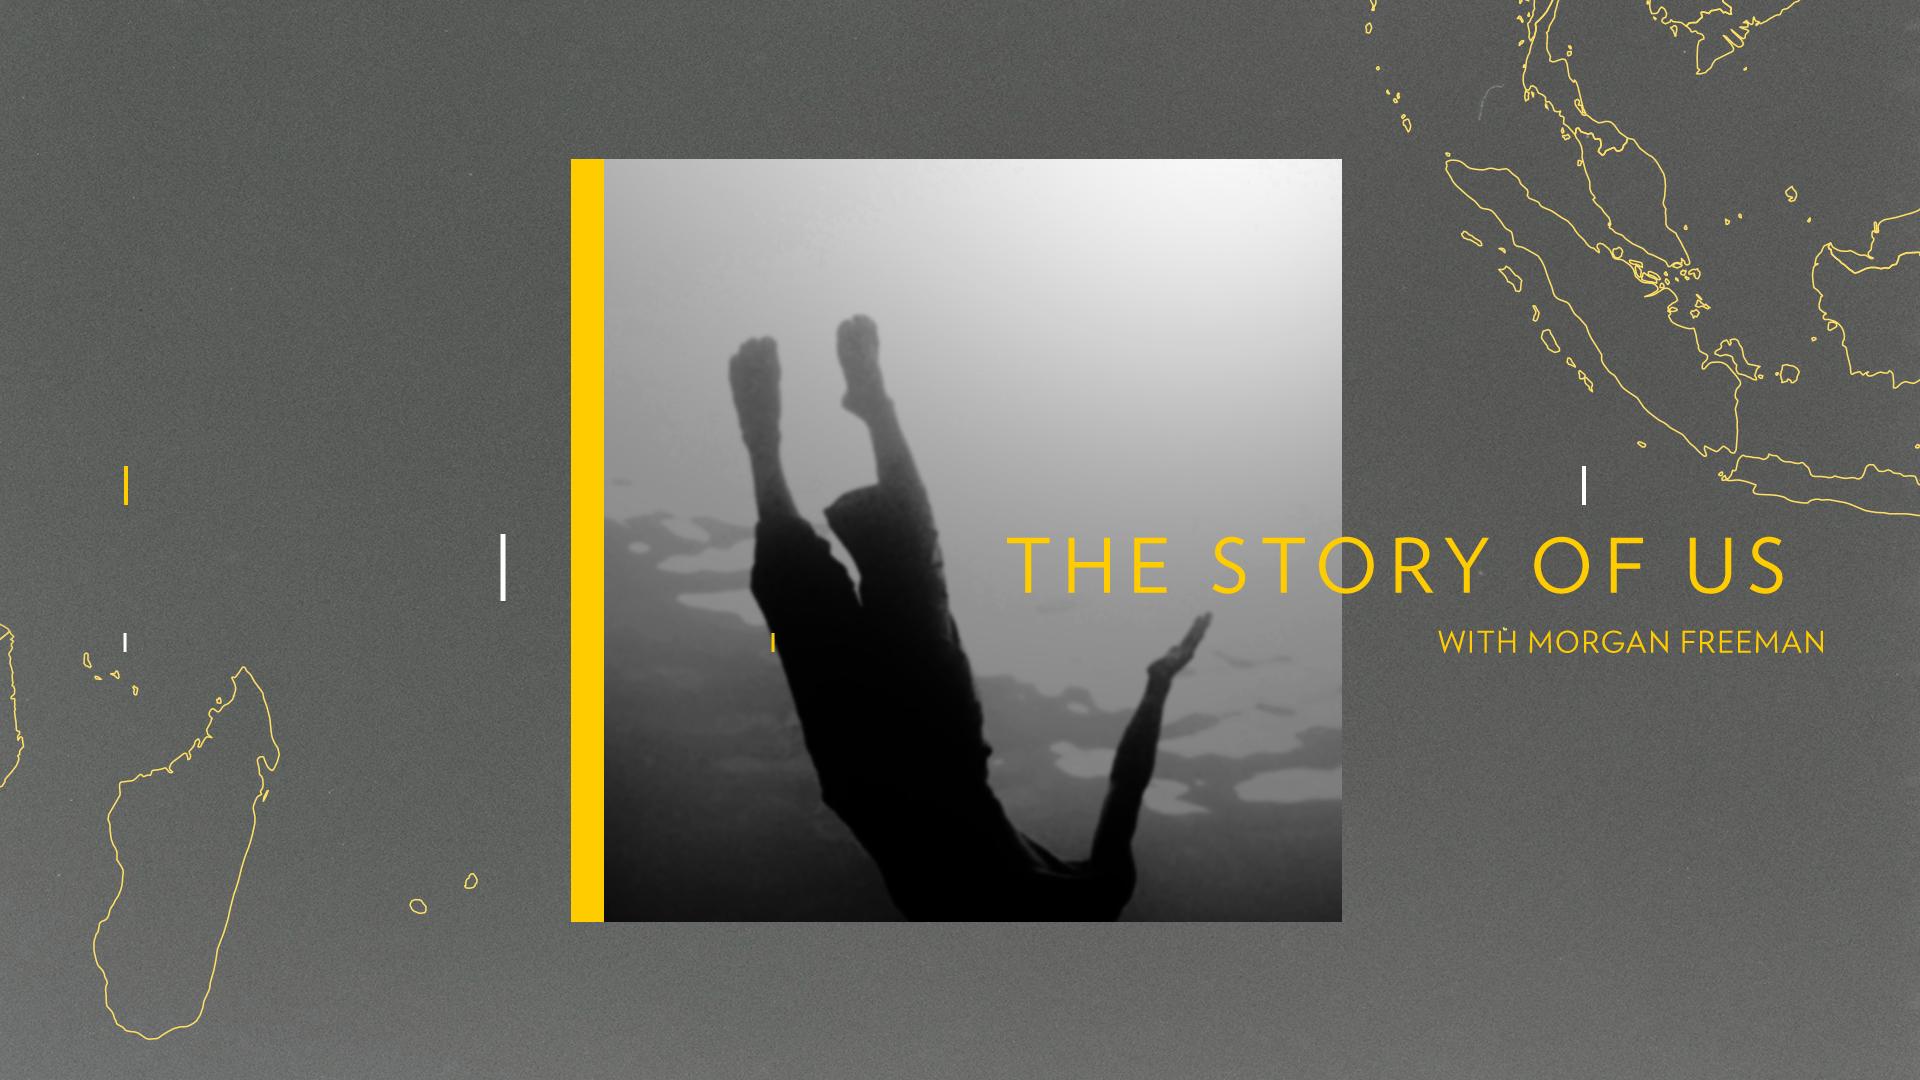 NATGEODID_StoryOfUs_Look2_003_R01.jpg